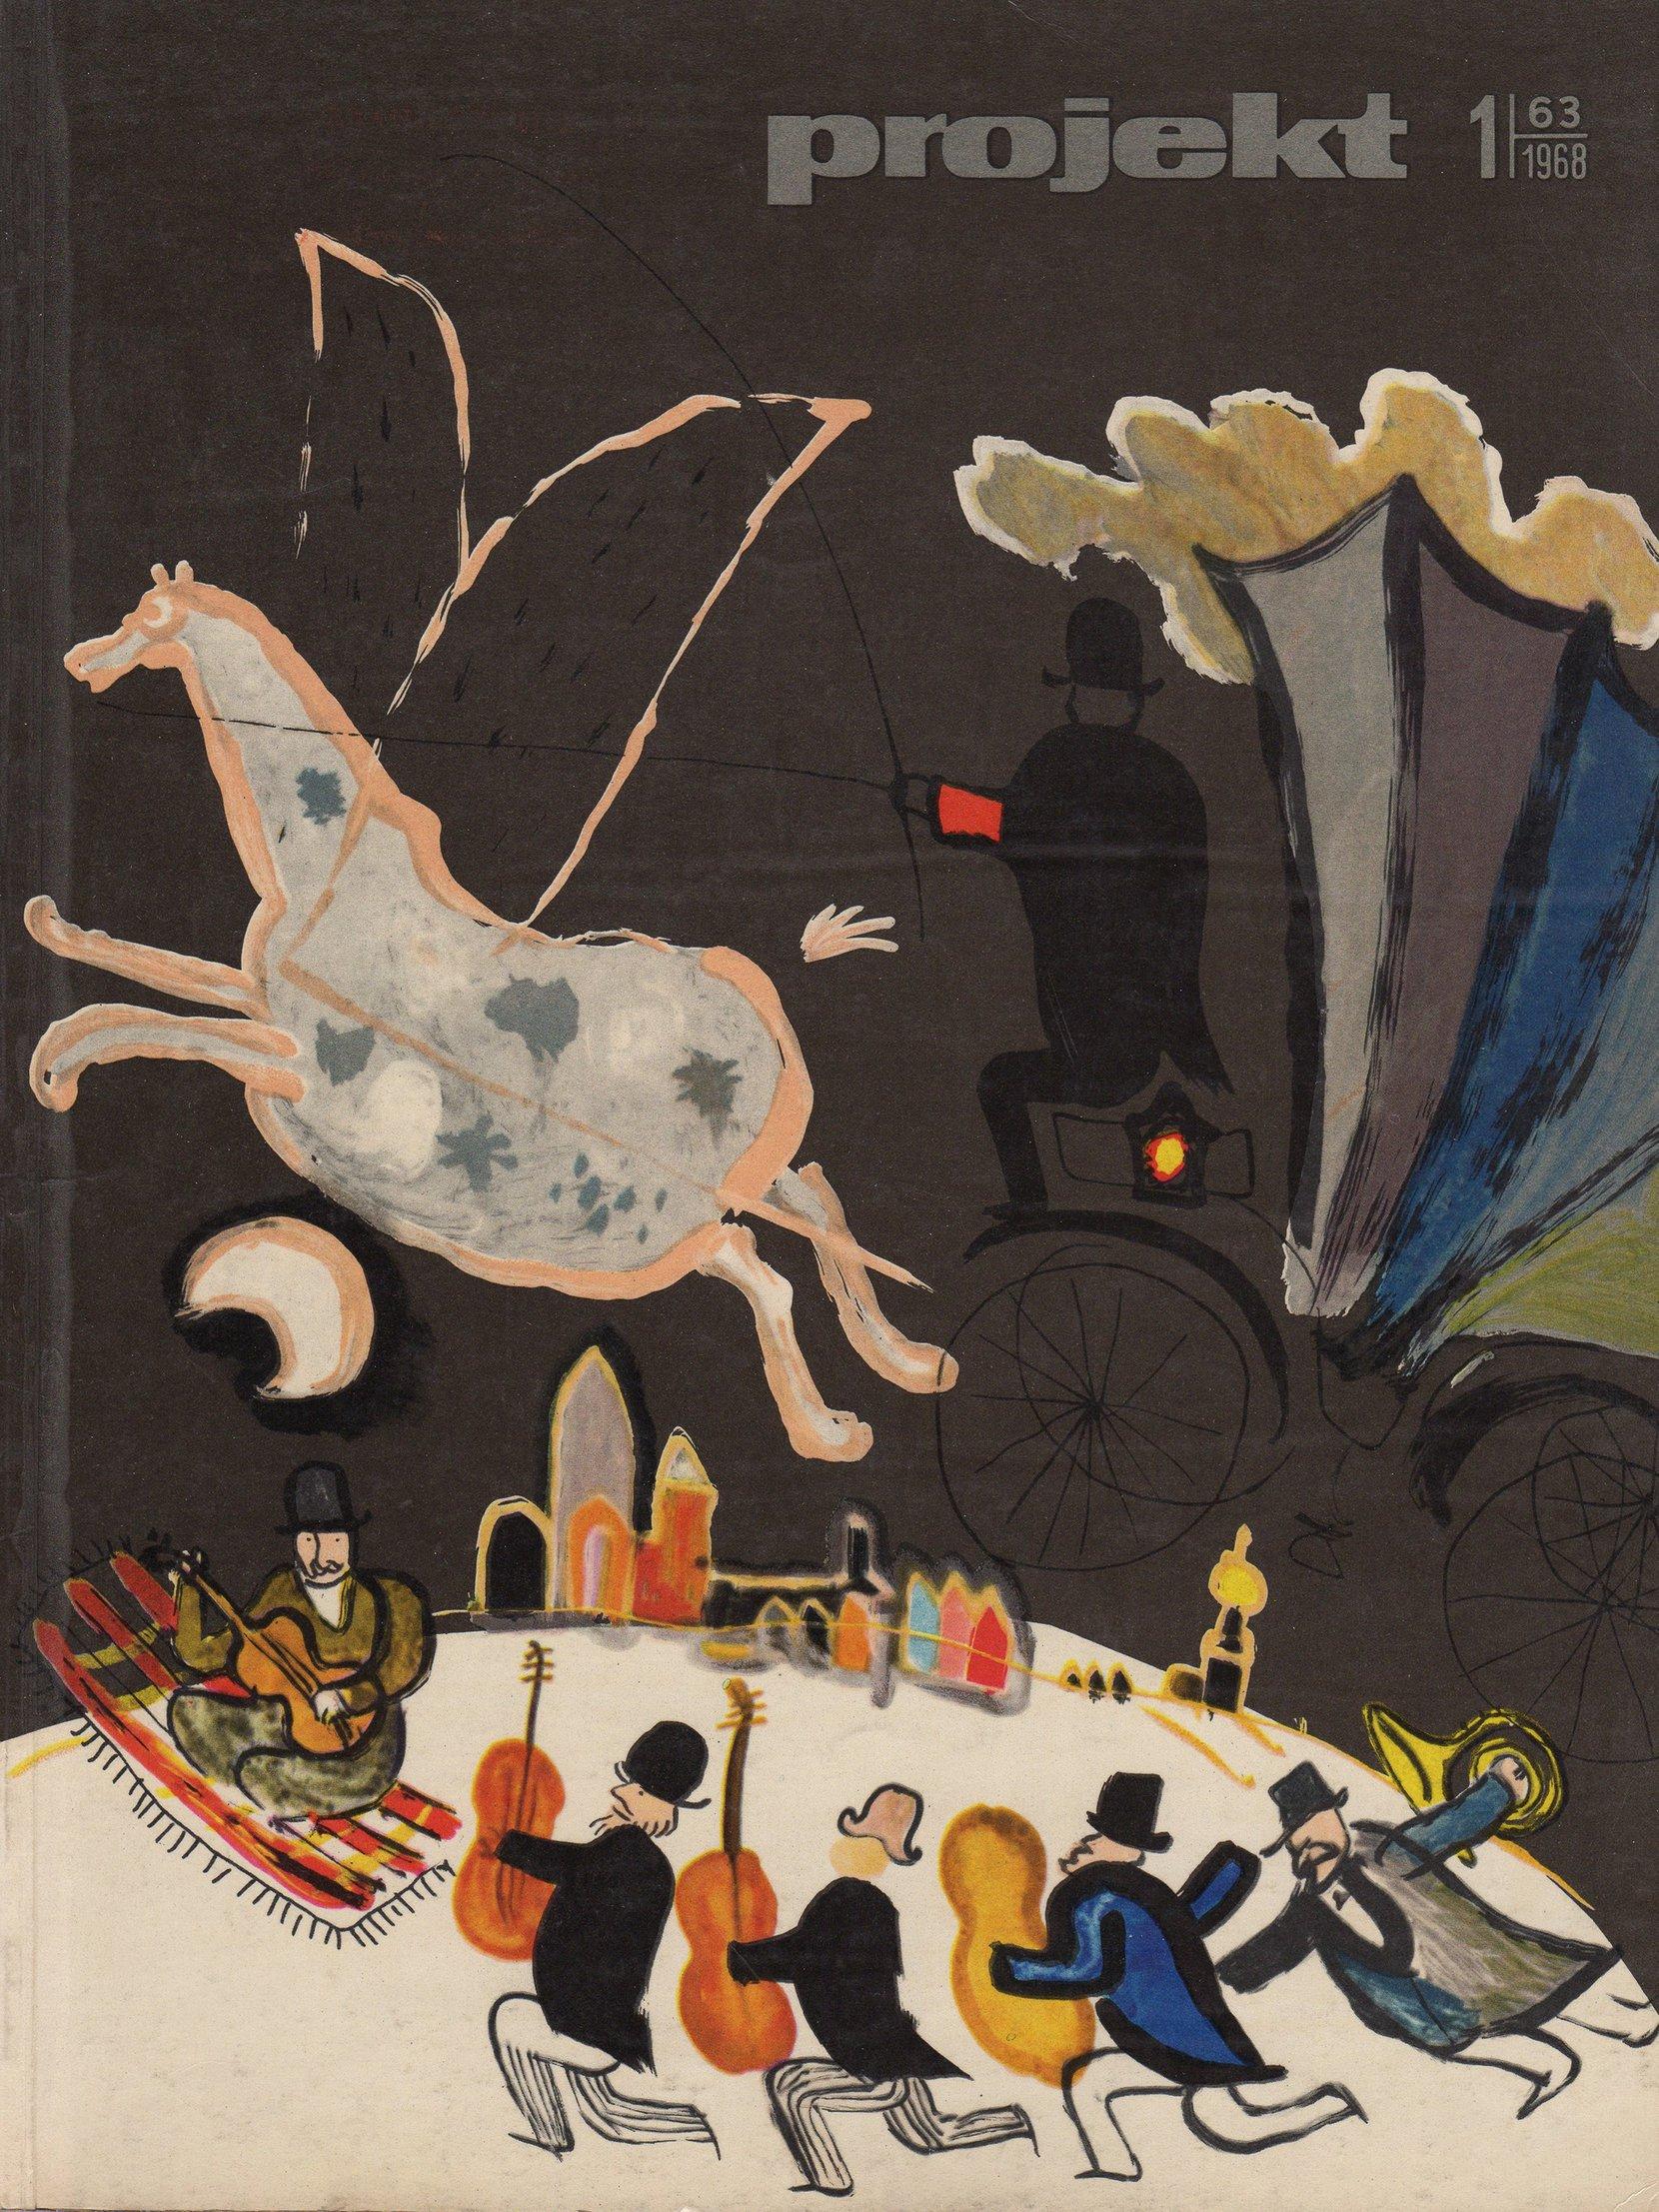 """projekt"" magazine, 1968-1 periodicals art & culture"